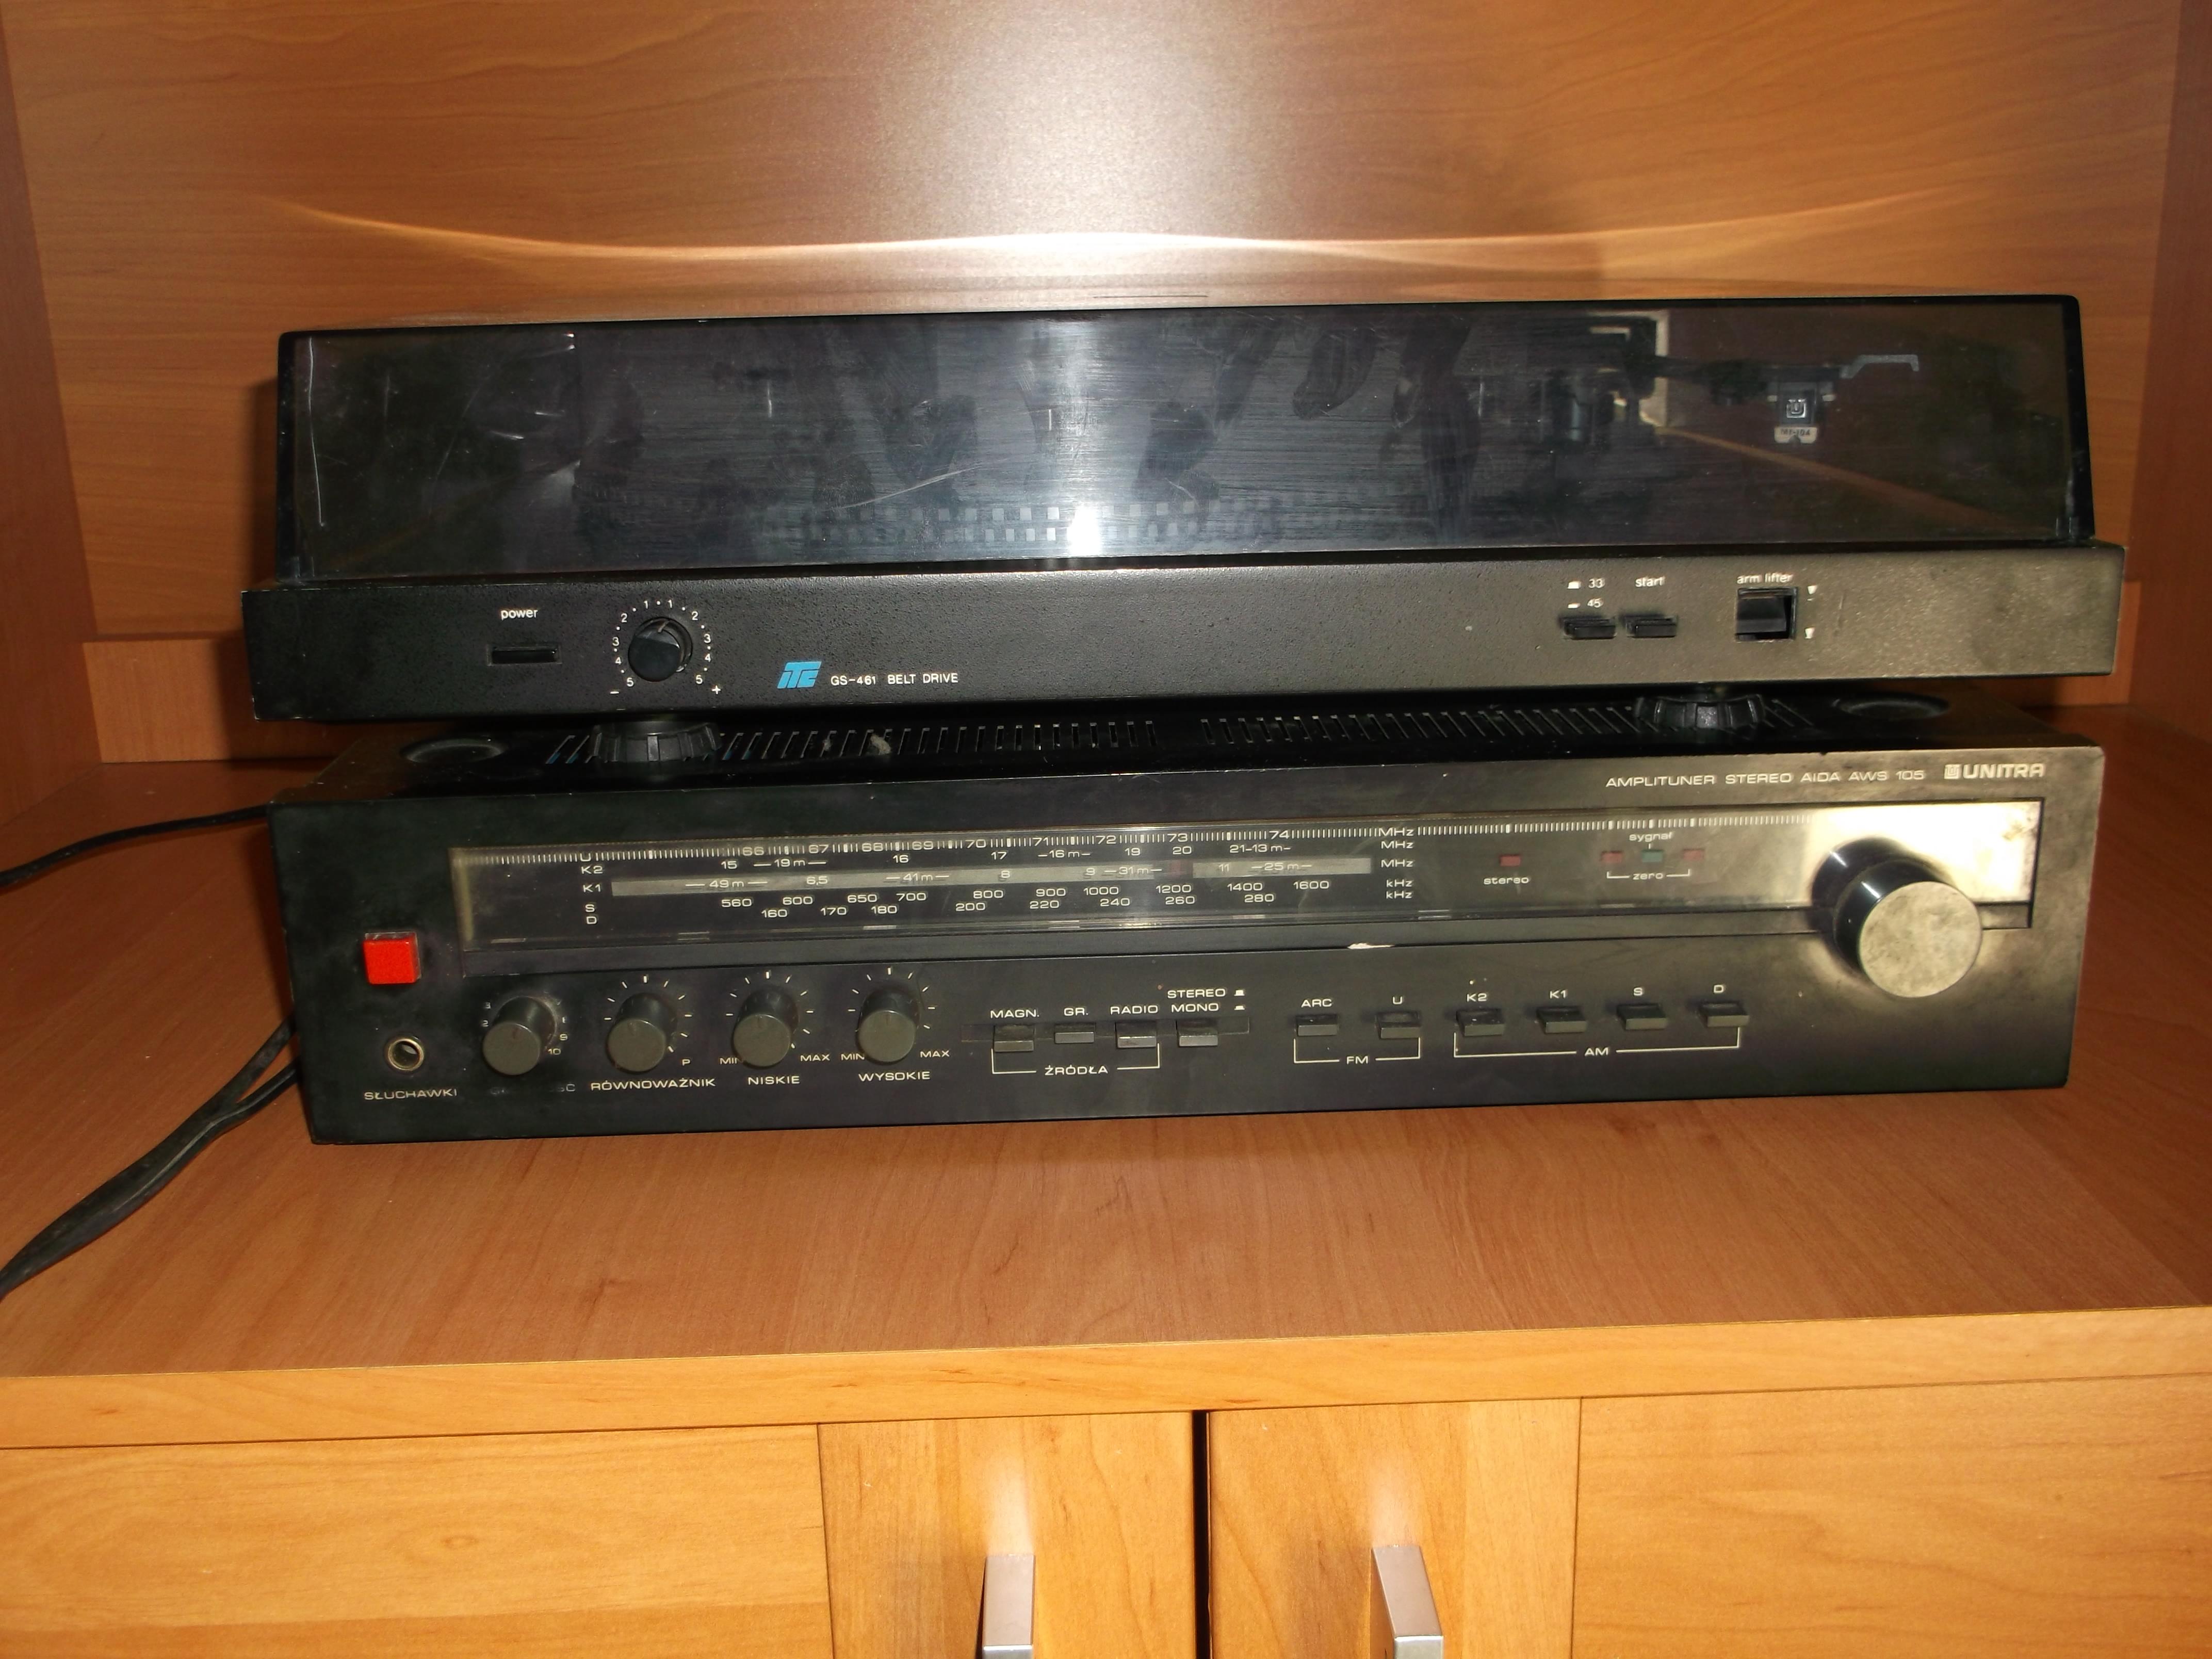 [Sprzedam] Amplituner Aida AWS 105 oraz gramofon GS-461